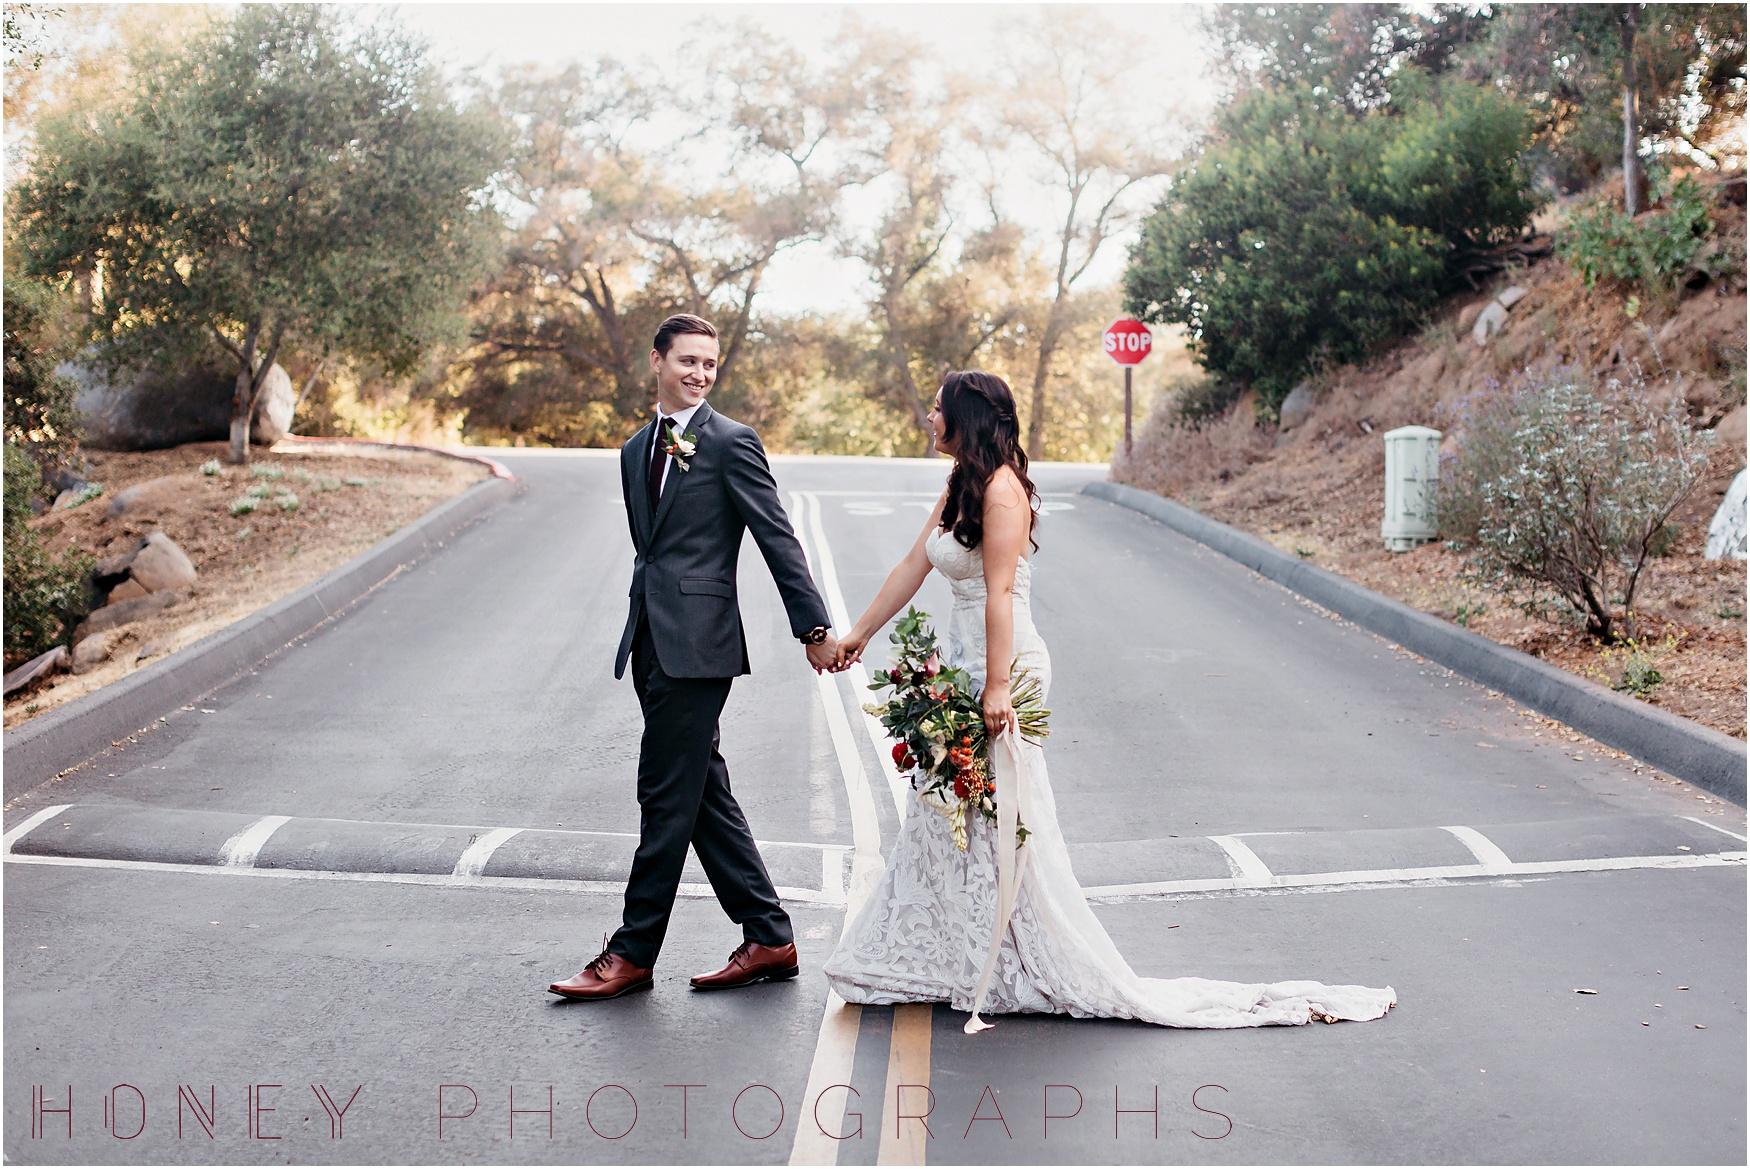 picnic-wedding-rustic-sweetheart-table-felicita-park-boho18.jpg